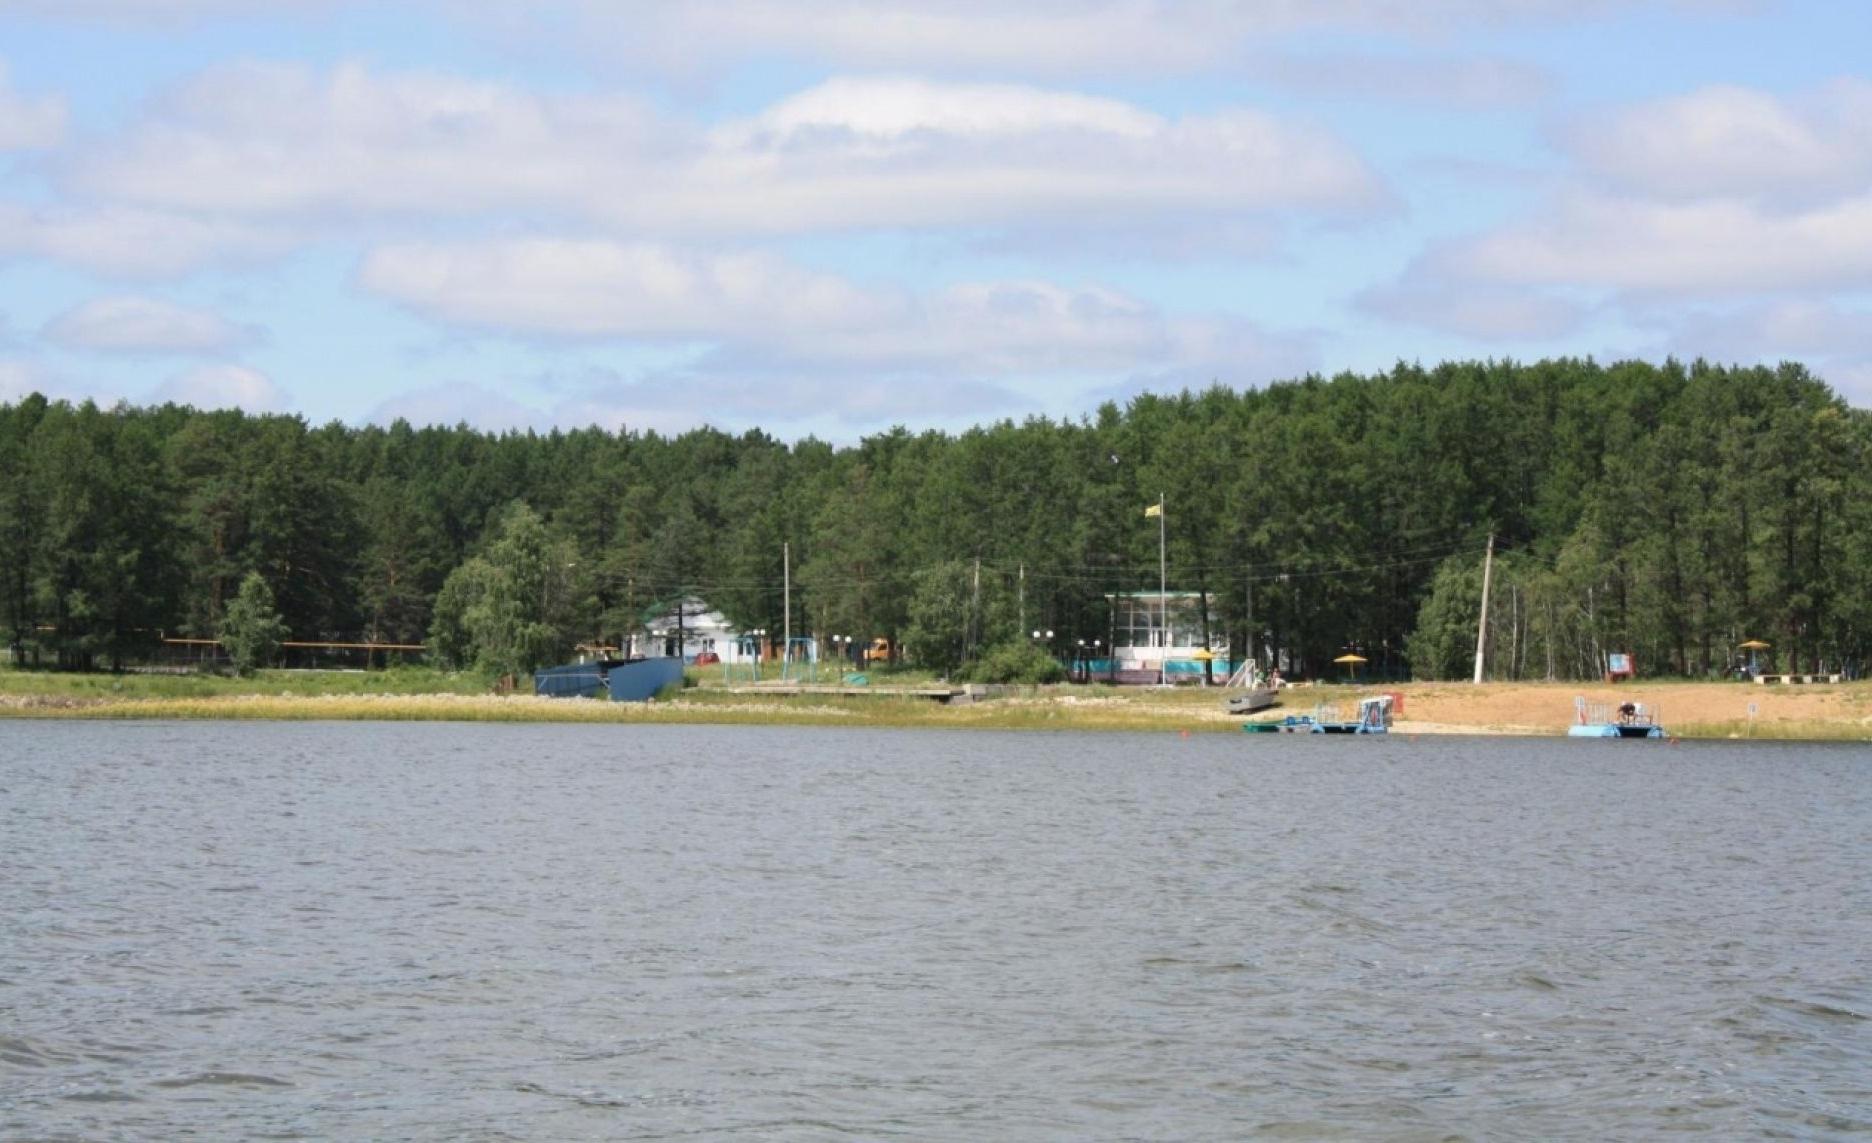 Туристический комплекс «Ургун» Республика Башкортостан, фото 14